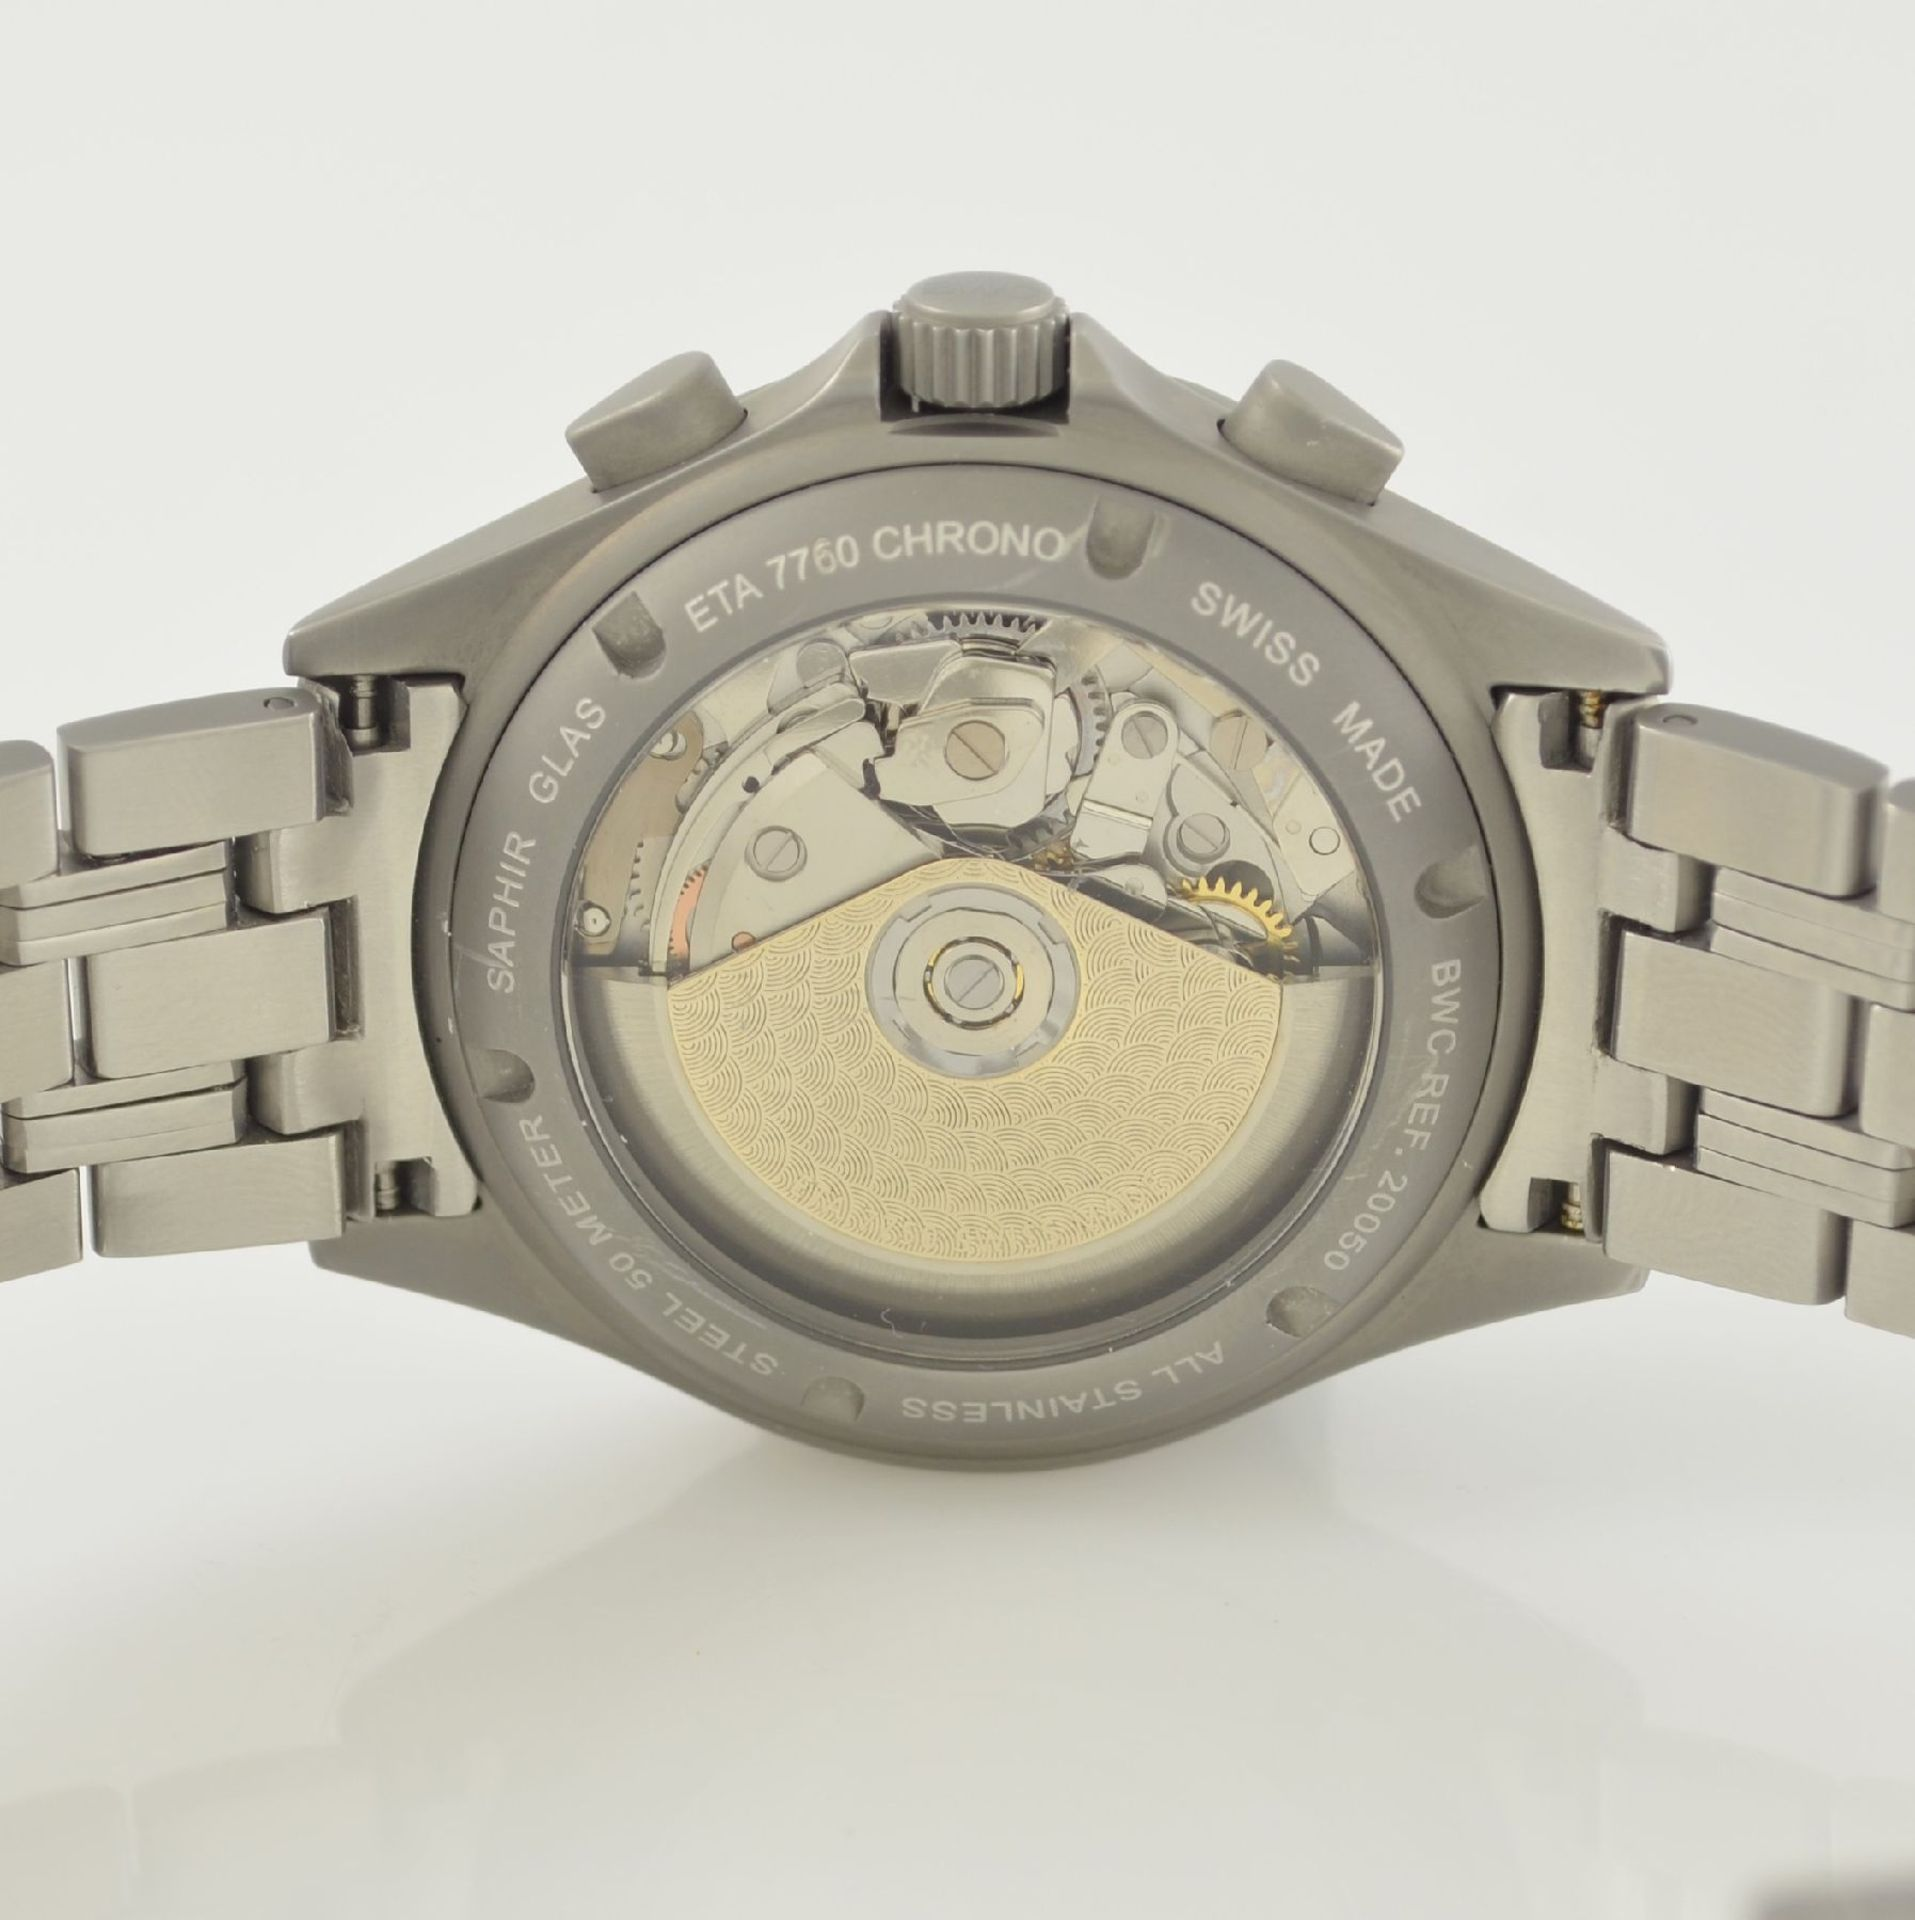 BWC Armbandchronograph, Automatik, Schweiz um 2010, matt. Edelstahlgeh. inkl. orig. Gliederband m. - Bild 6 aus 7